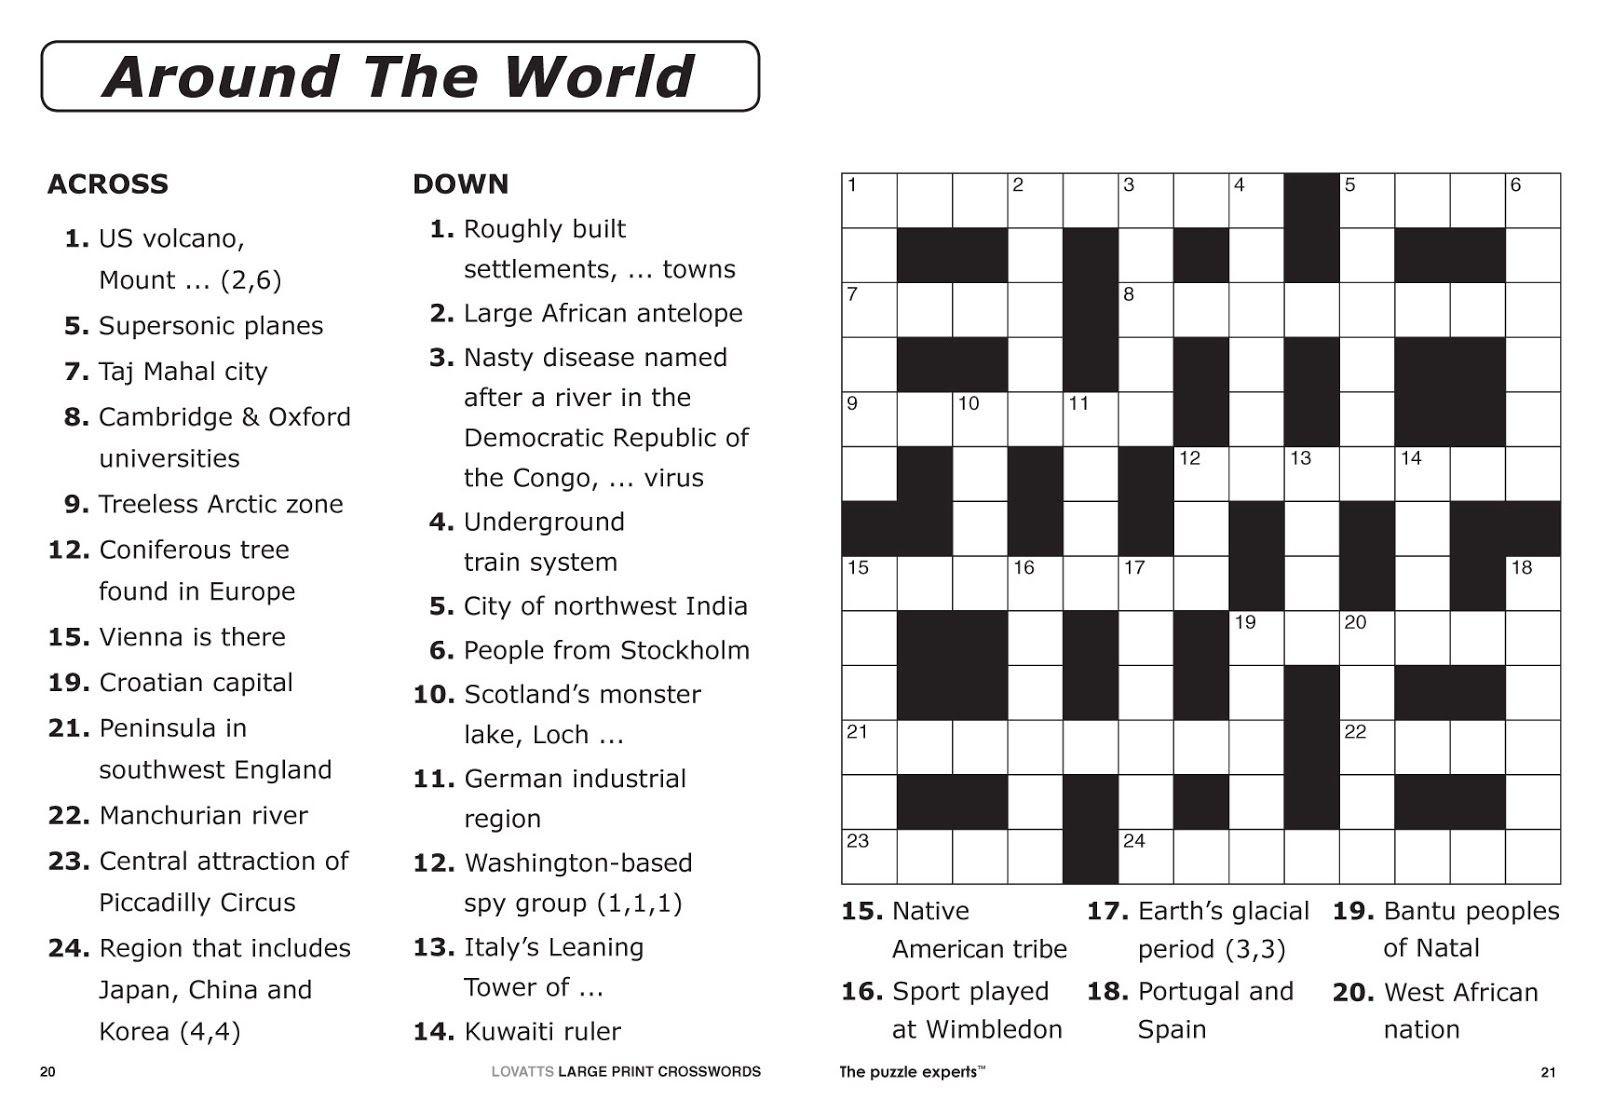 Free Printable Large Print Crossword Puzzles | M3U8 - Free Printable Large Print Crossword Puzzles